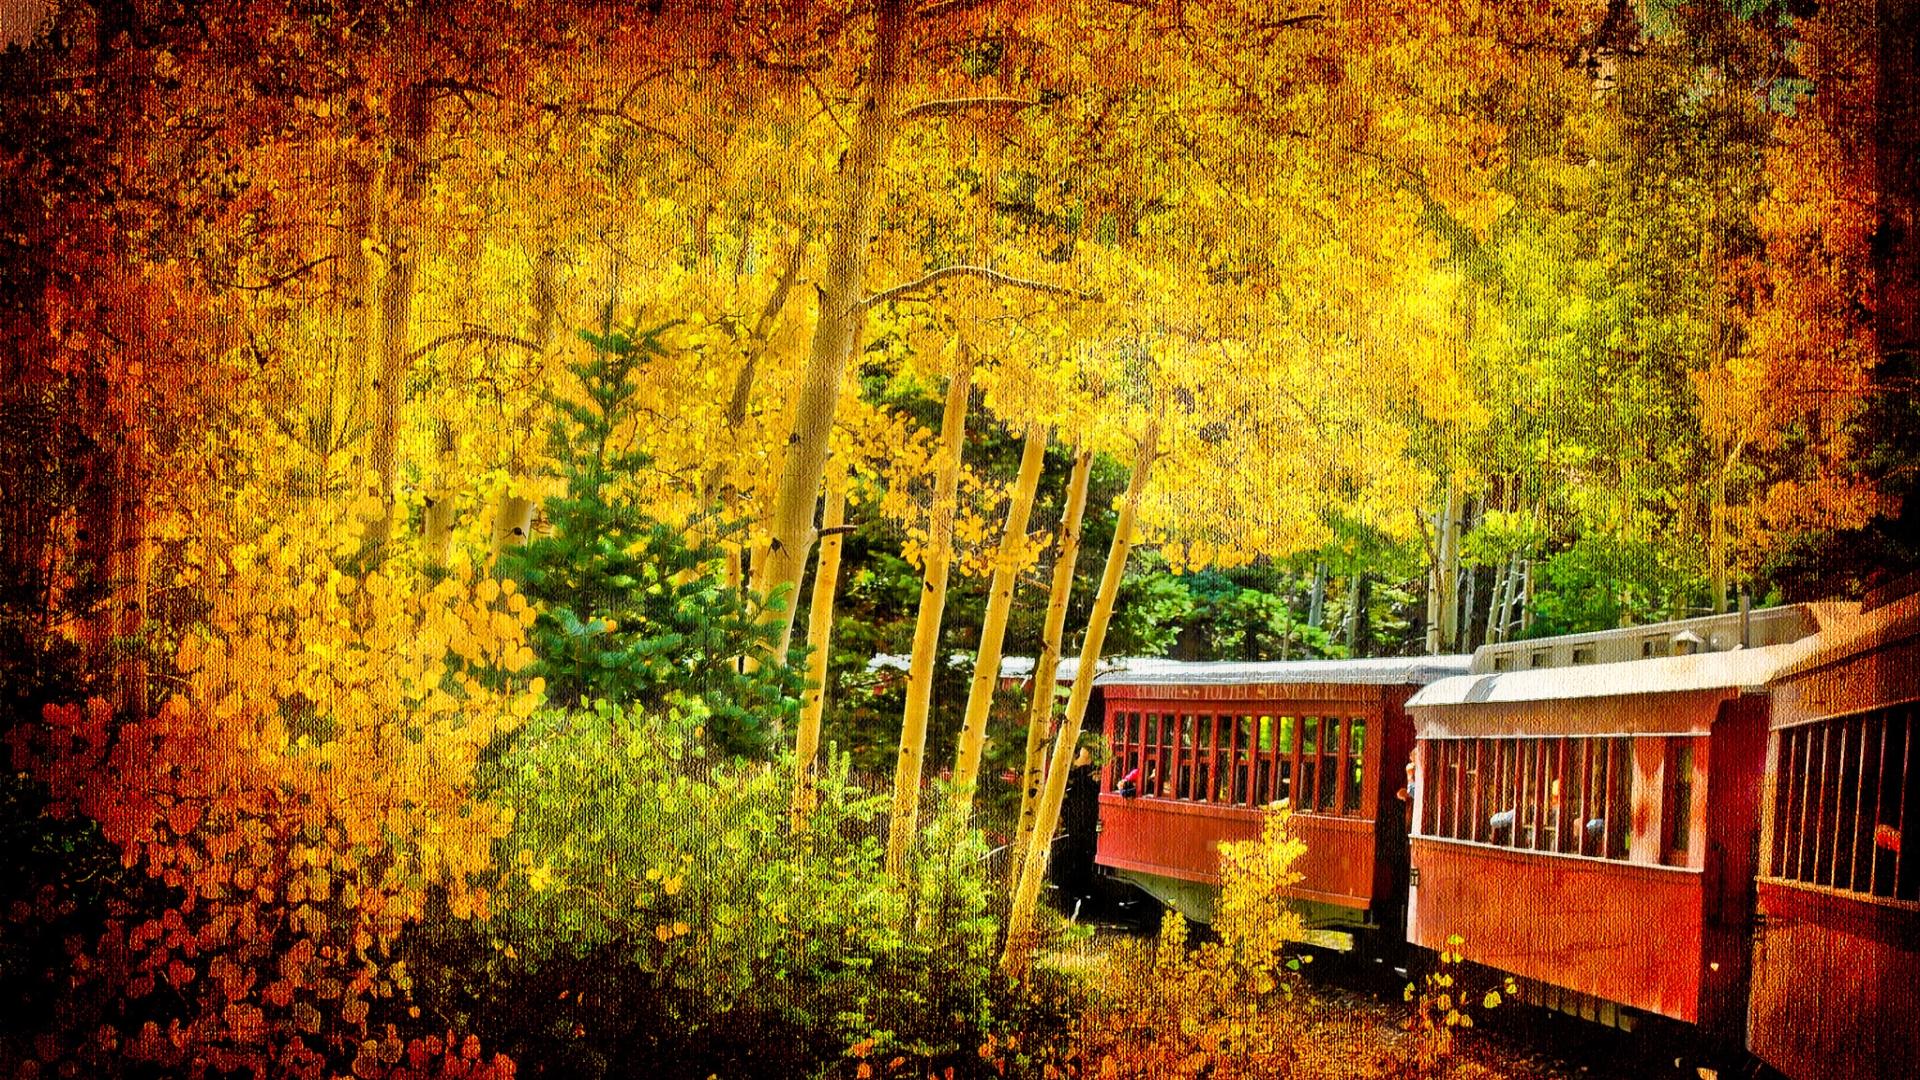 Fall Colors Wallpaper 1920x1080 Autumn Train Hd Wallpaper Background Image 1920x1080